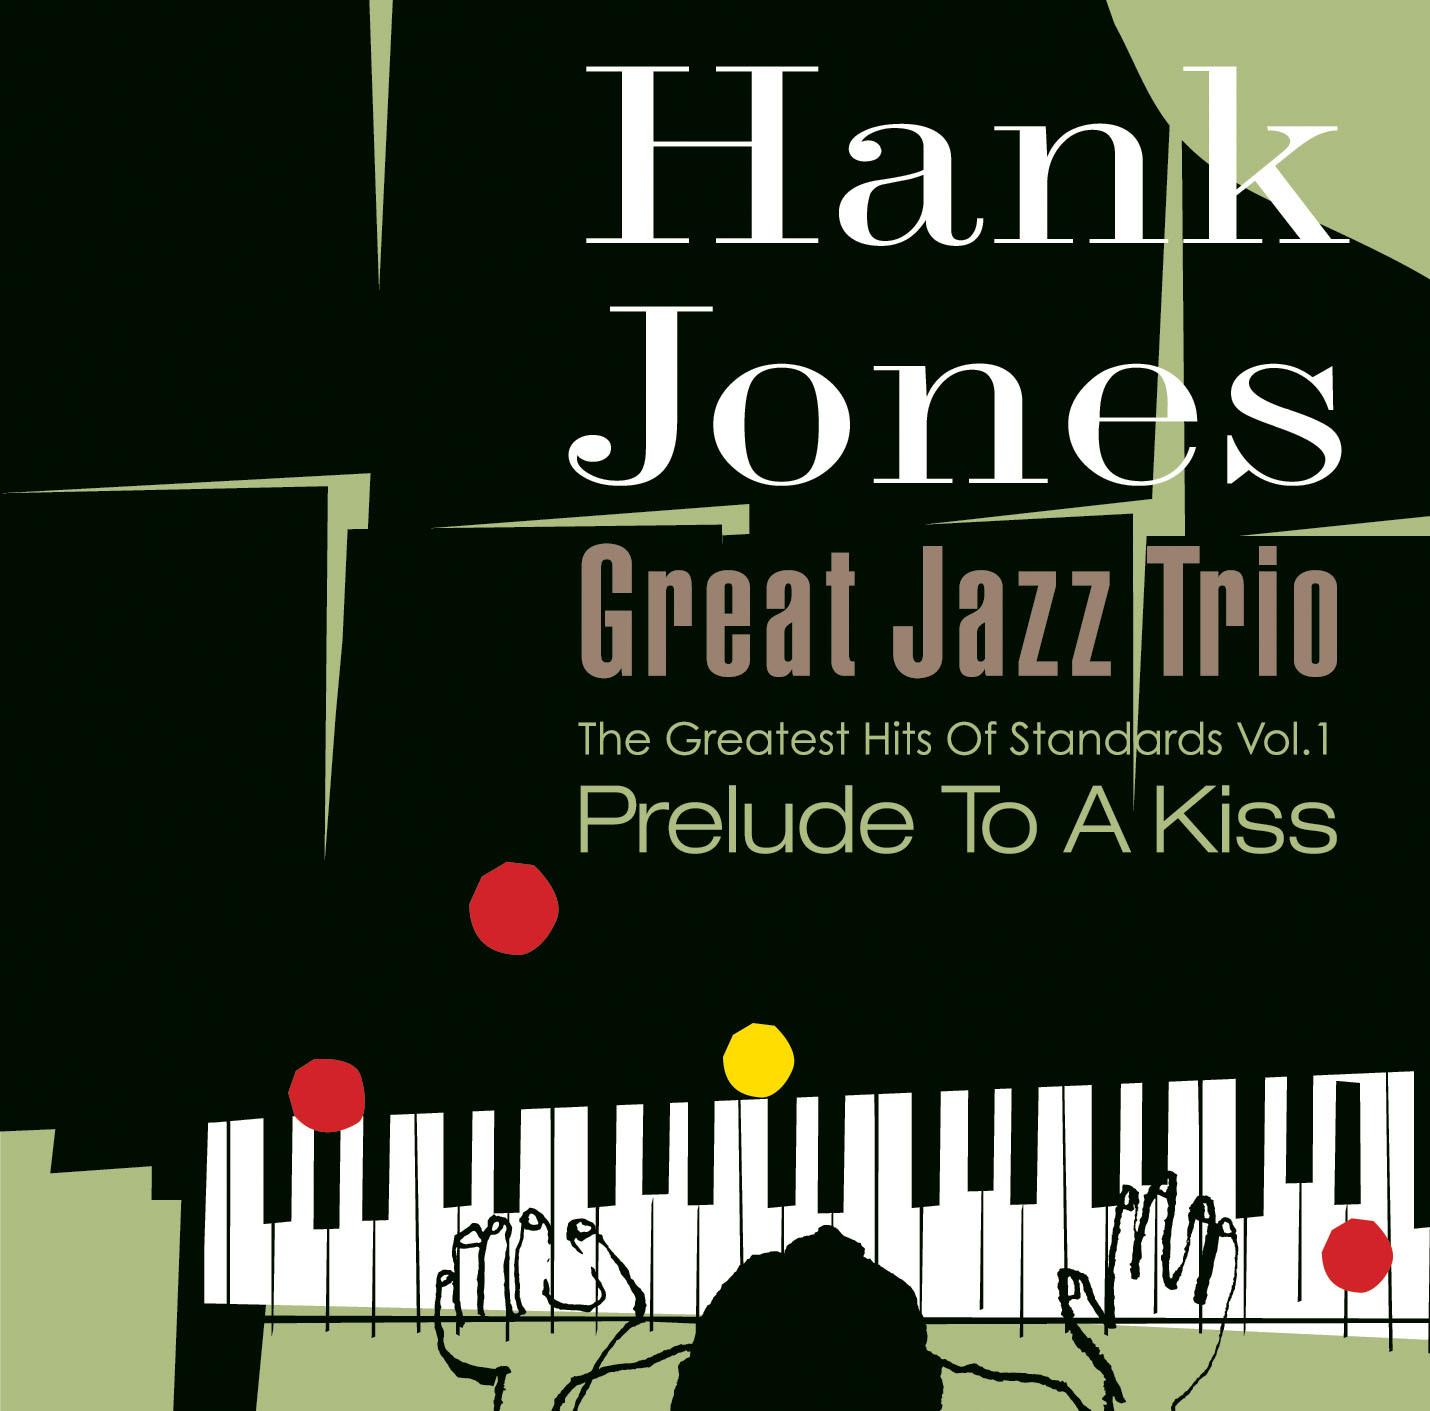 HANK JONES - Hank Jones Great Jazz Trio, The Greatest Hits Of Standards Vol.1: Prelude To A Kiss cover